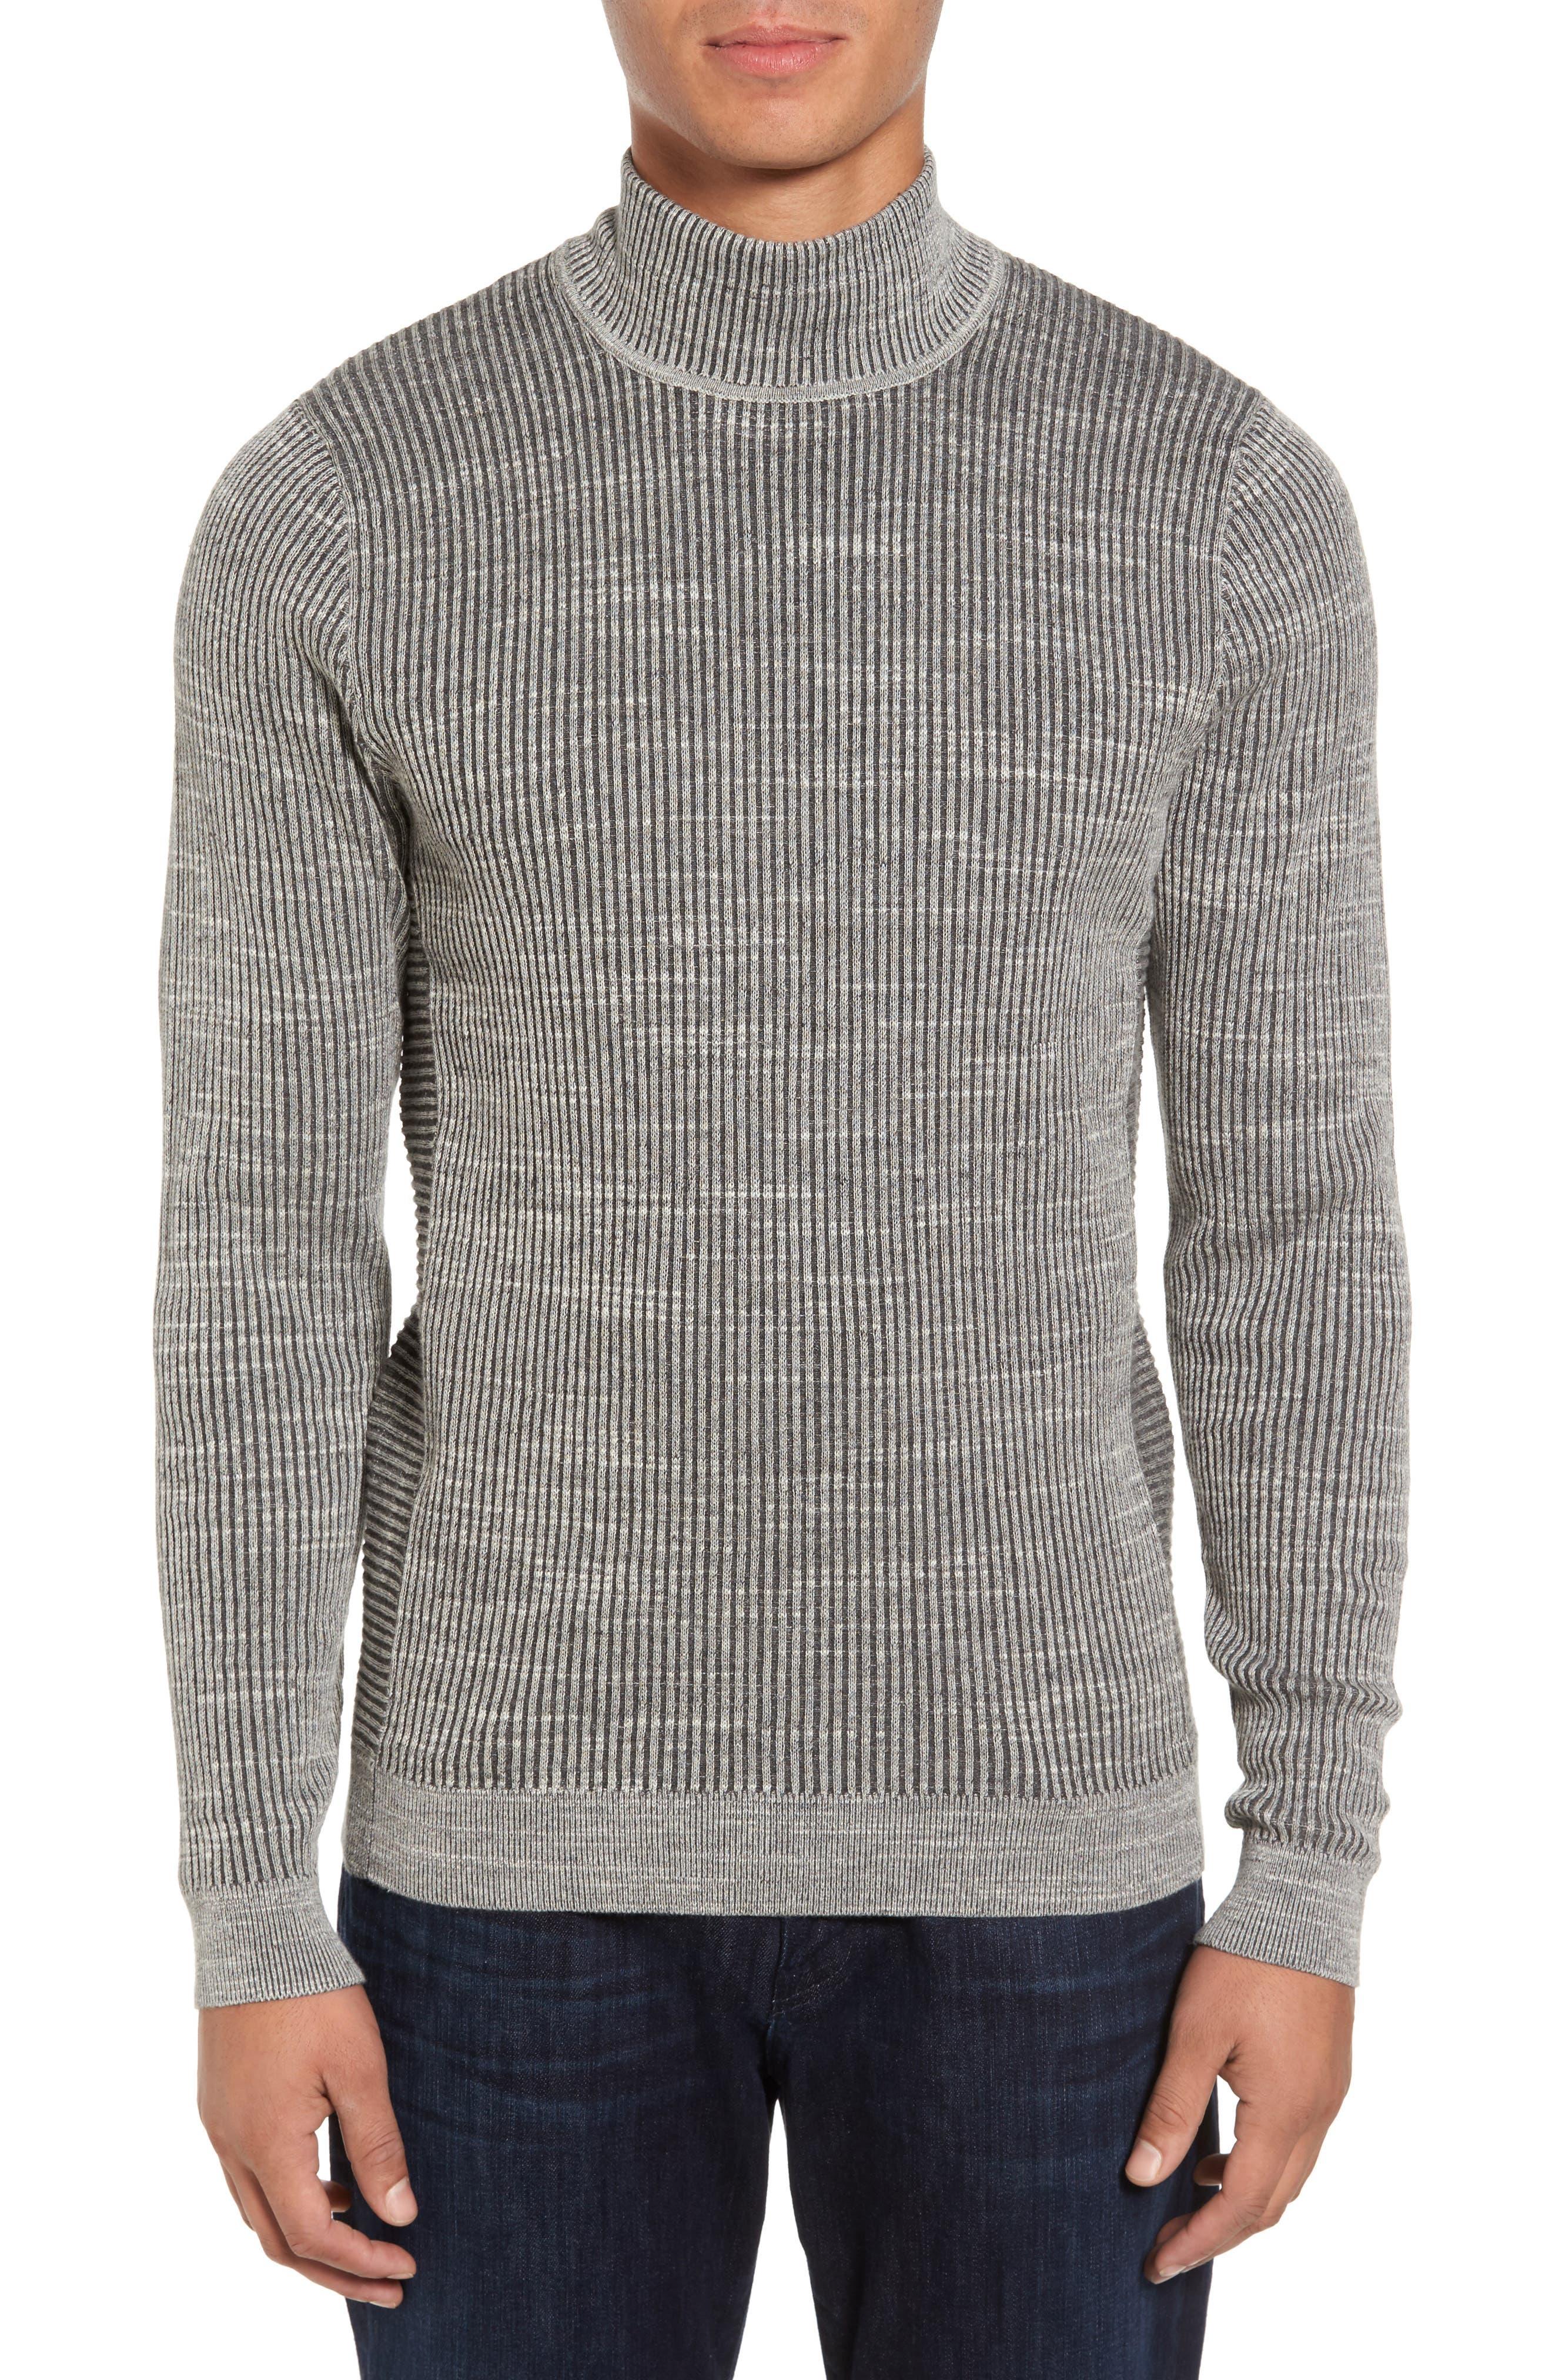 Mock Neck Sweater,                         Main,                         color, Grey Dark Charcoal